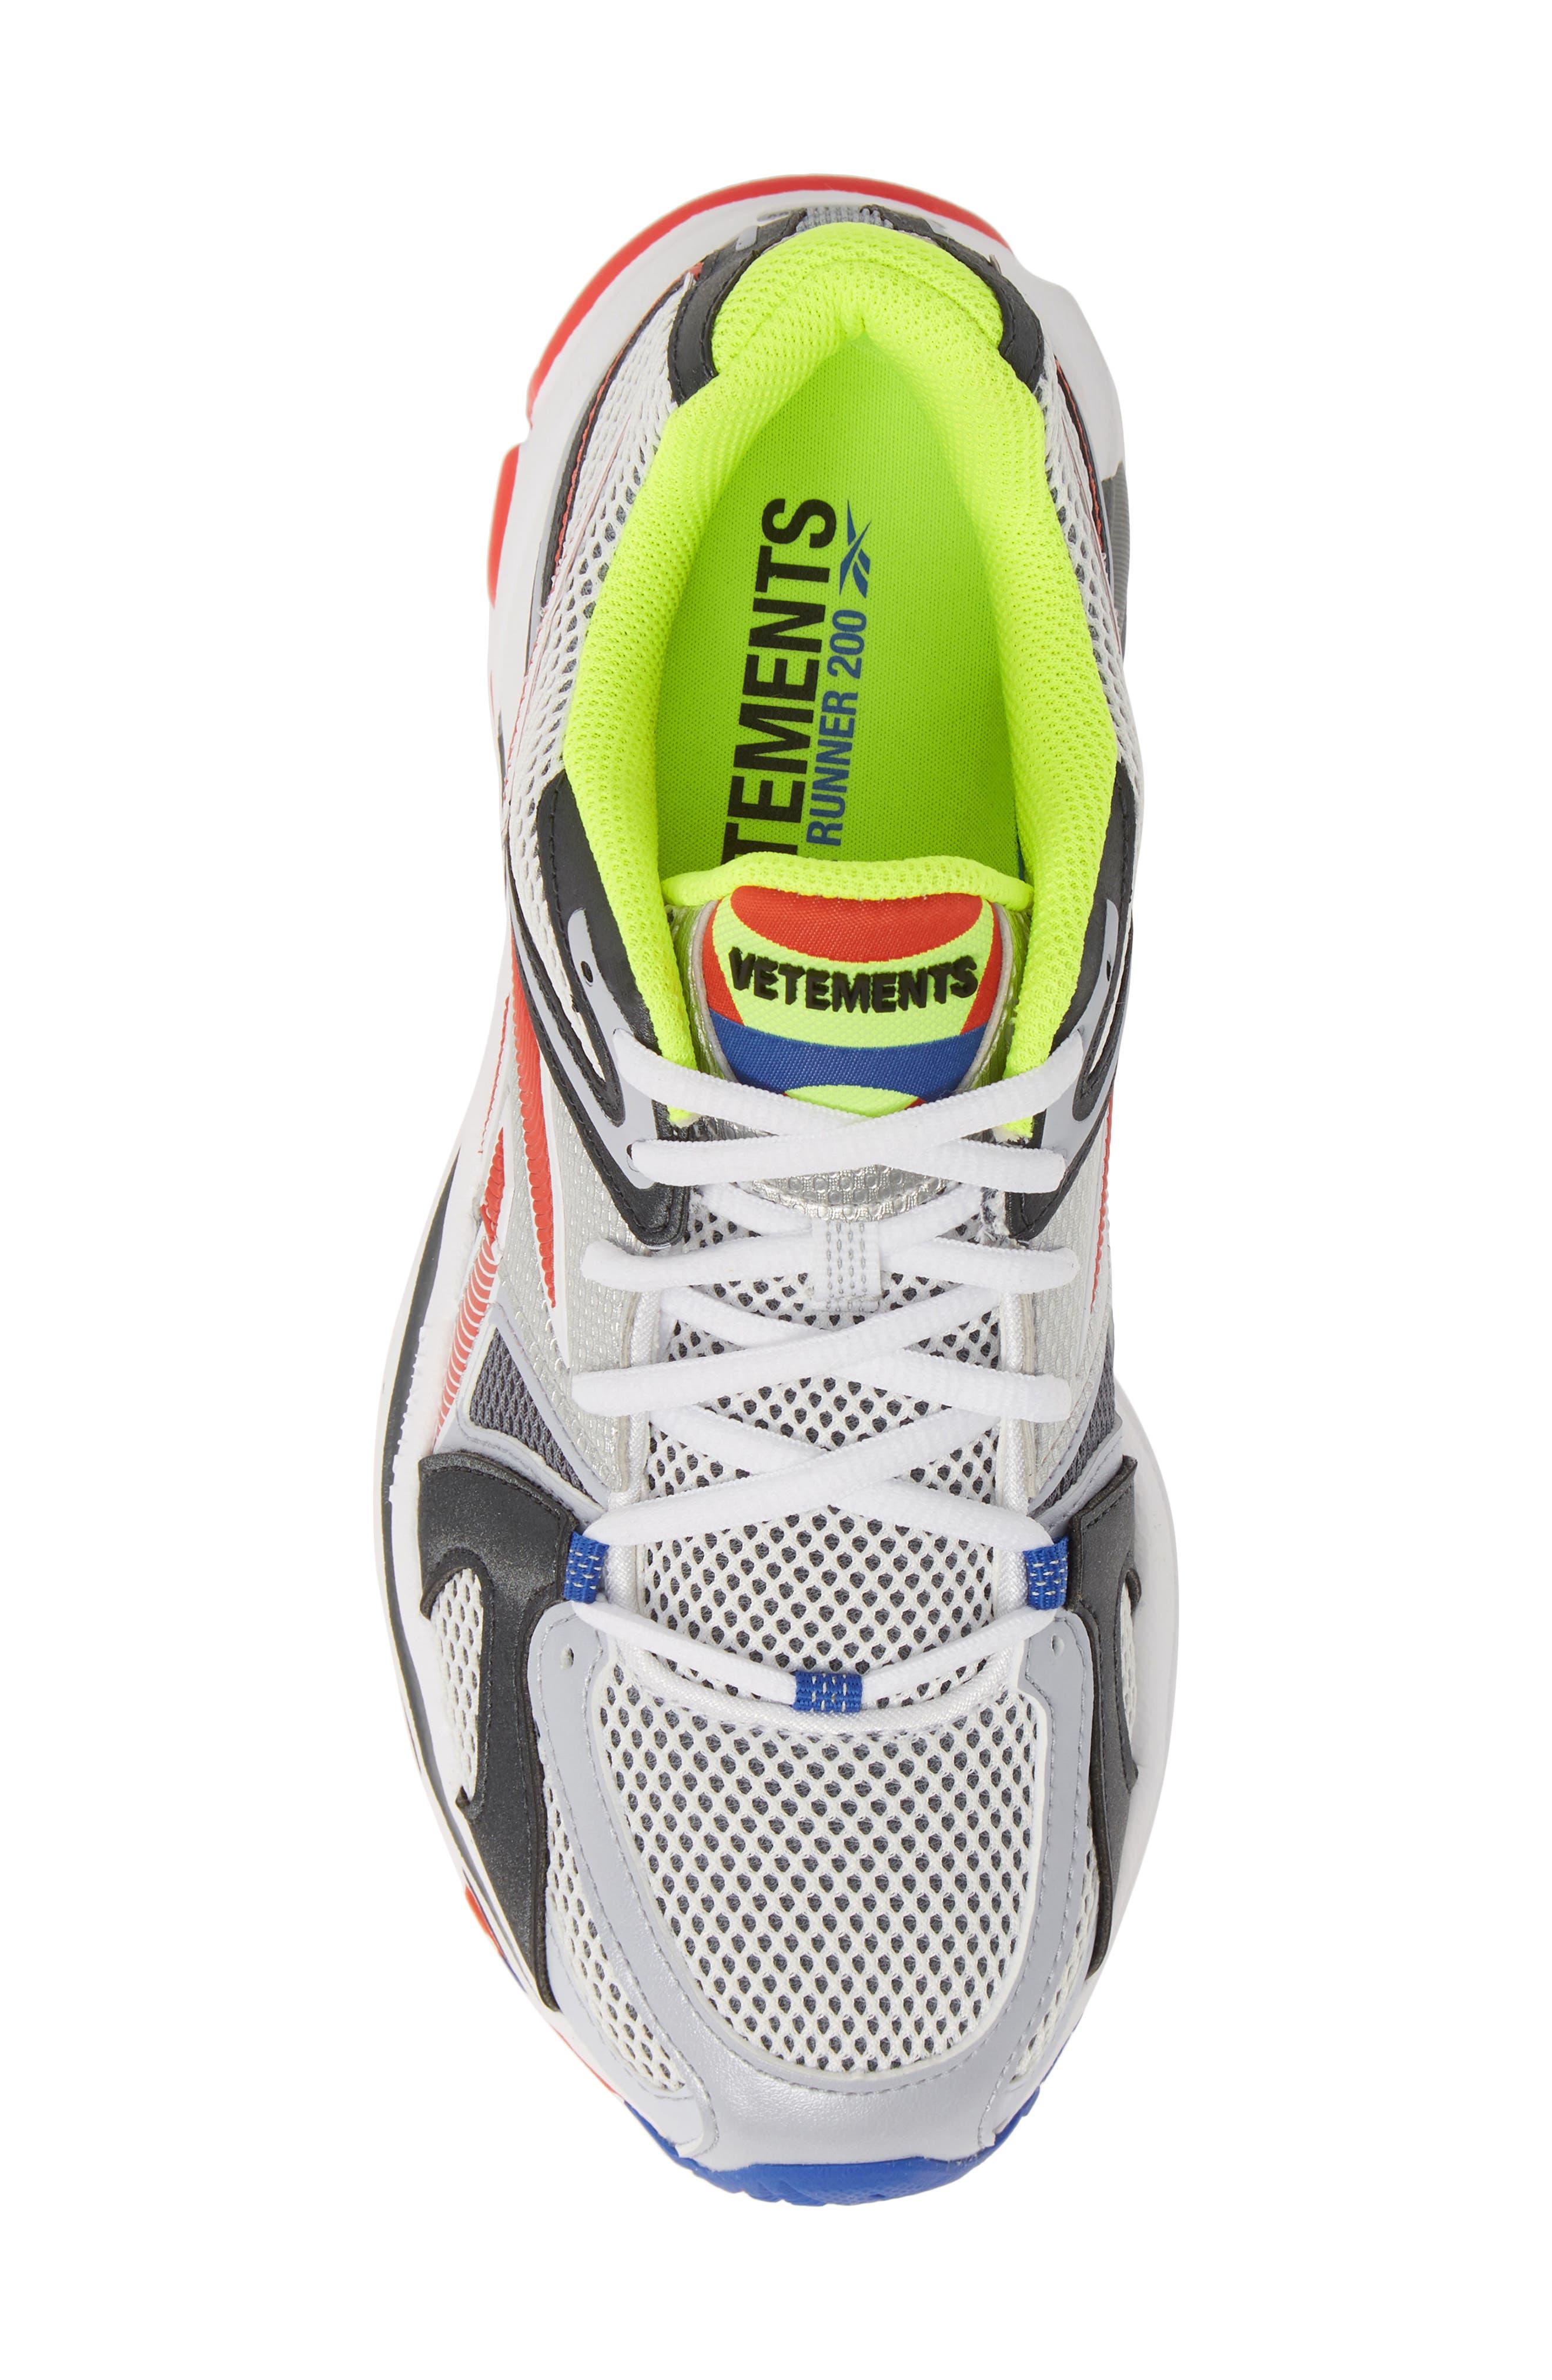 VETEMENTS, x Reebok Spike Runner 200 Sneaker, Alternate thumbnail 5, color, FLUO YELLOW